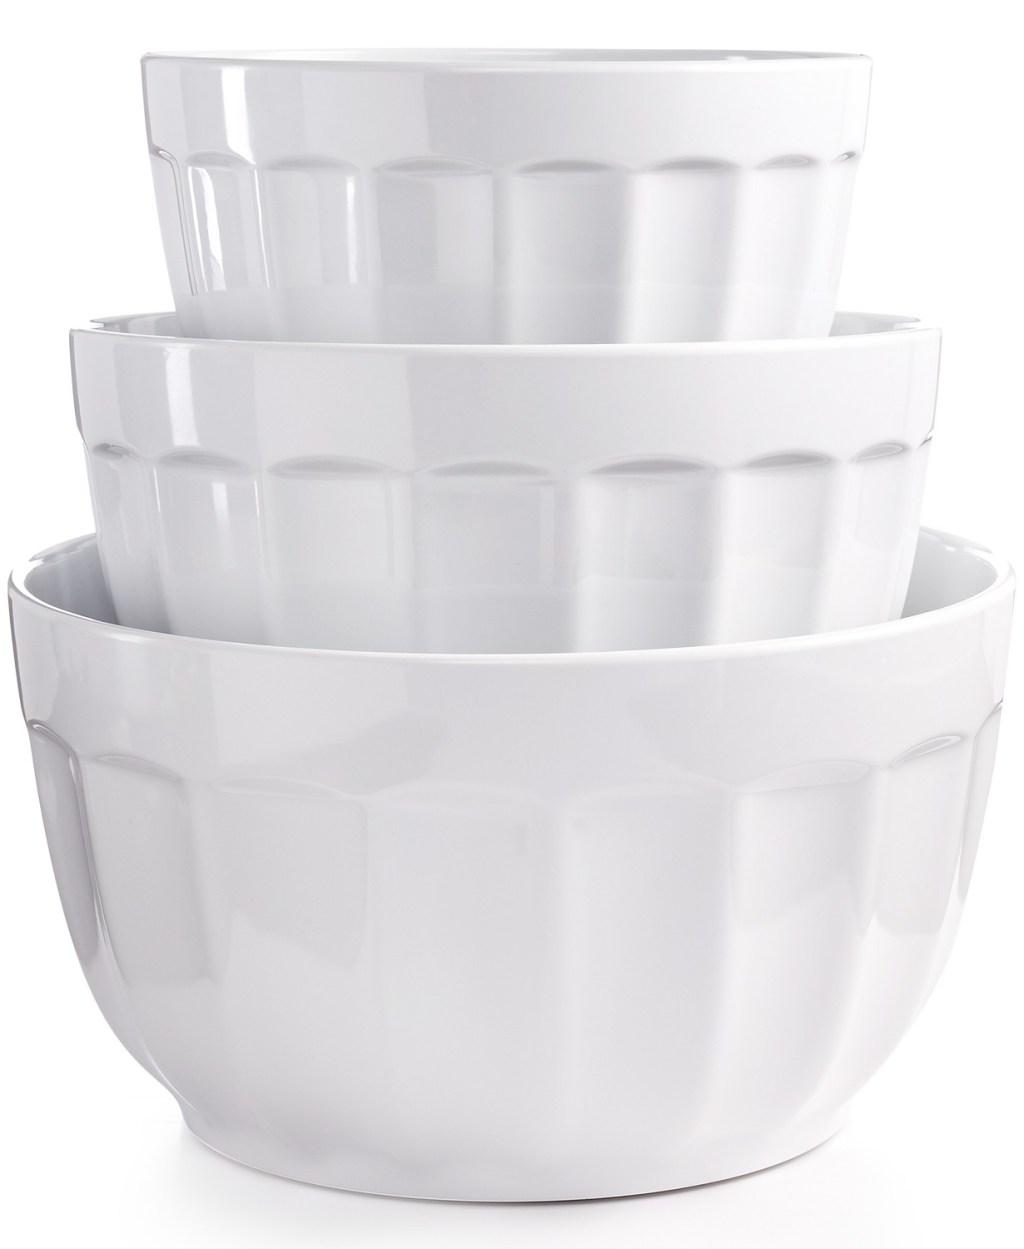 martha stewart melamine fluted mixing bowls white stacked